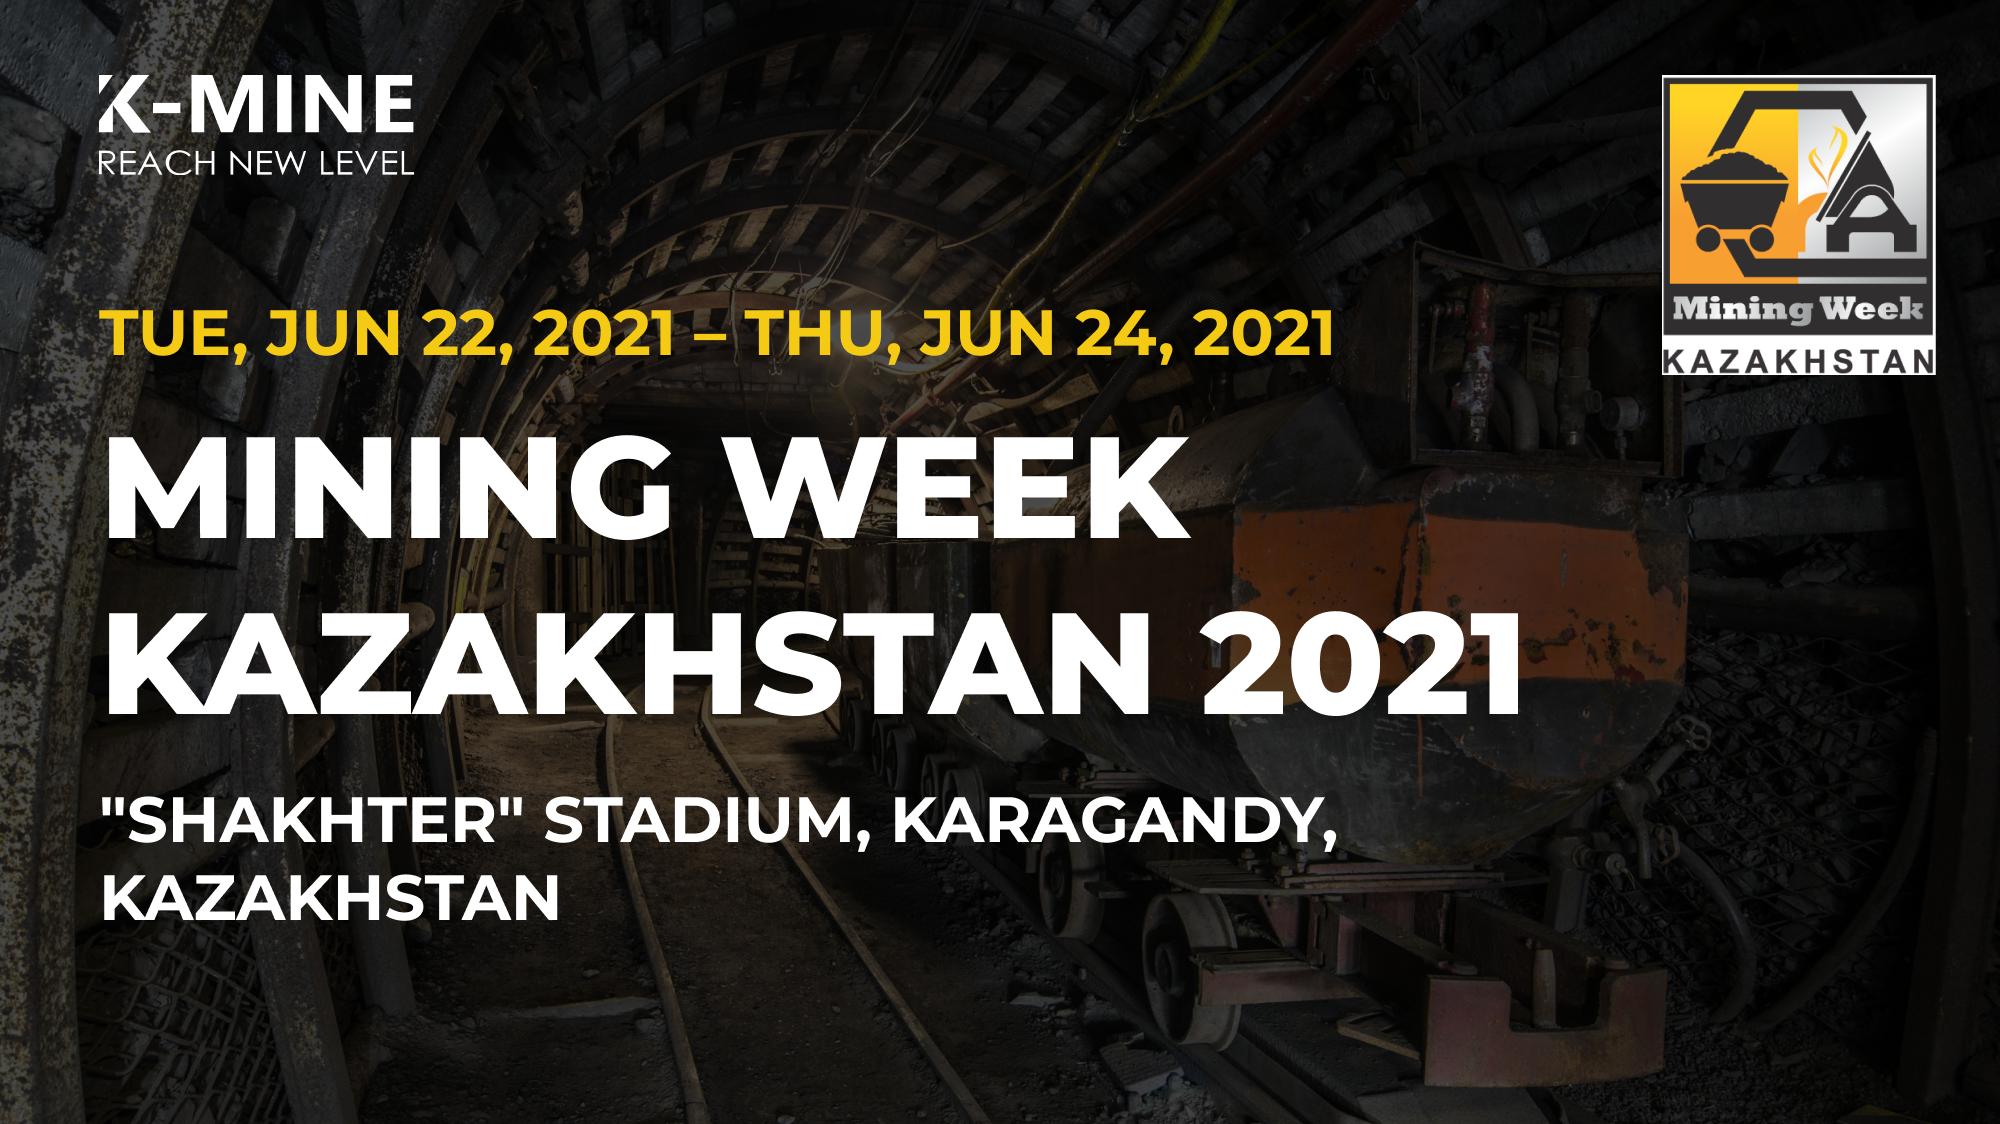 K-MINE participate Mining Week Kazakhstan 2021